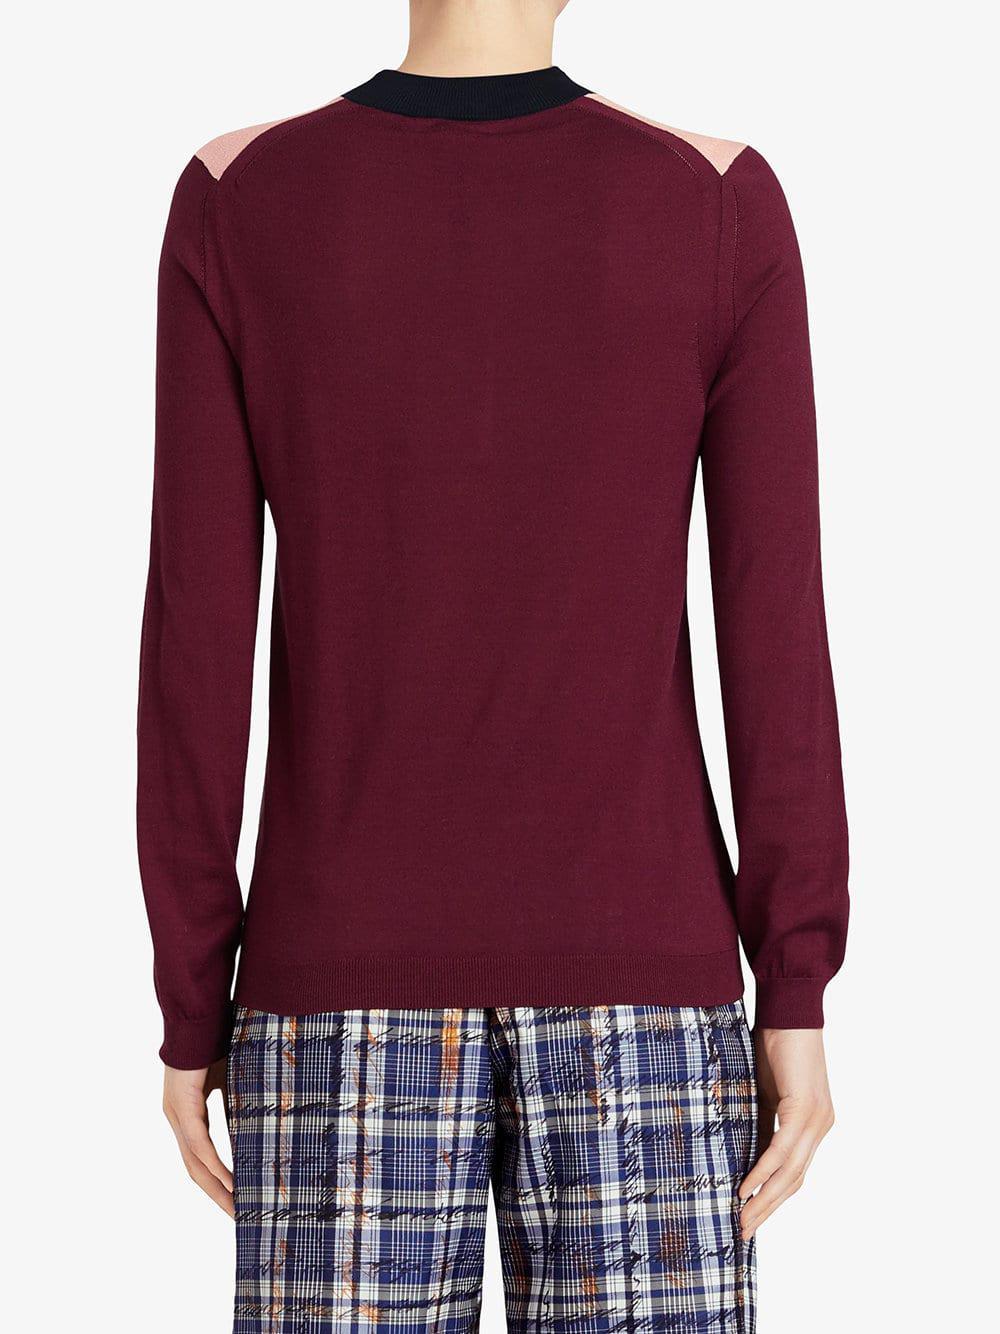 Colour View Silk Cashmere Pink Lyst Block Fullscreen Burberry Sweater A5qxSw7gRF